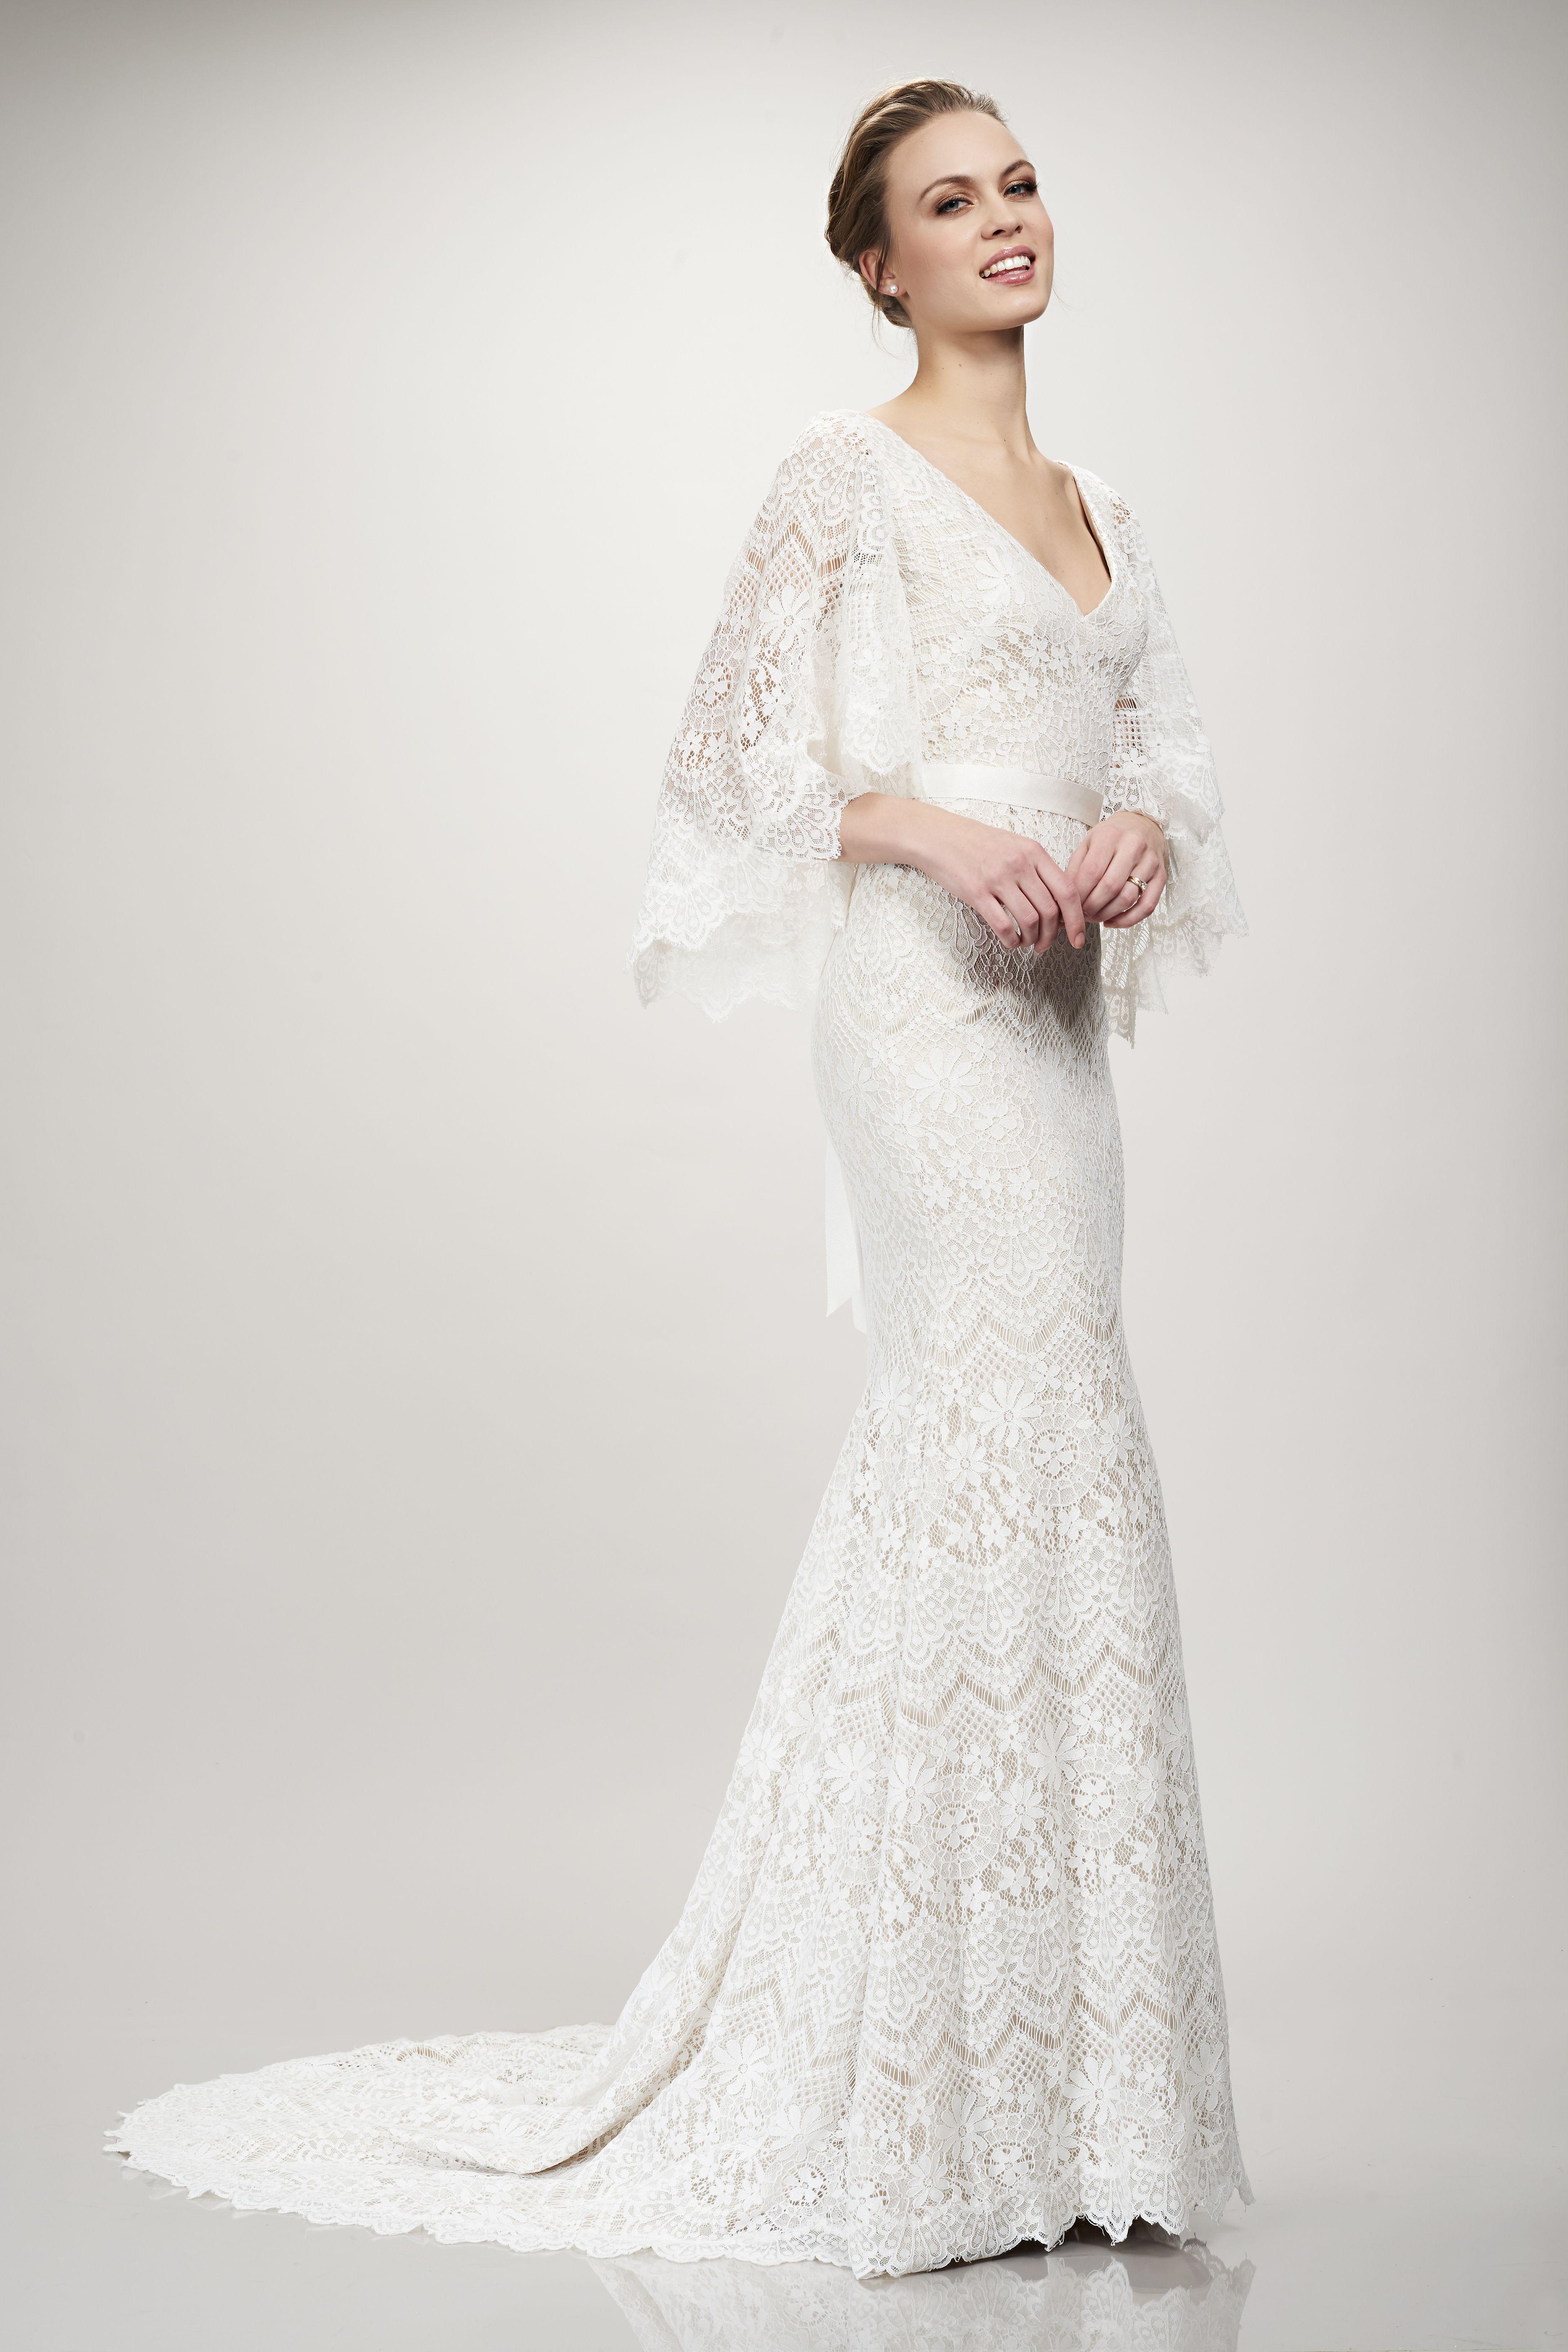 Boho wedding dress with sleeves  THEIA Bridal Sandy Bridal Gown boho bohemian lace cape wedding dress